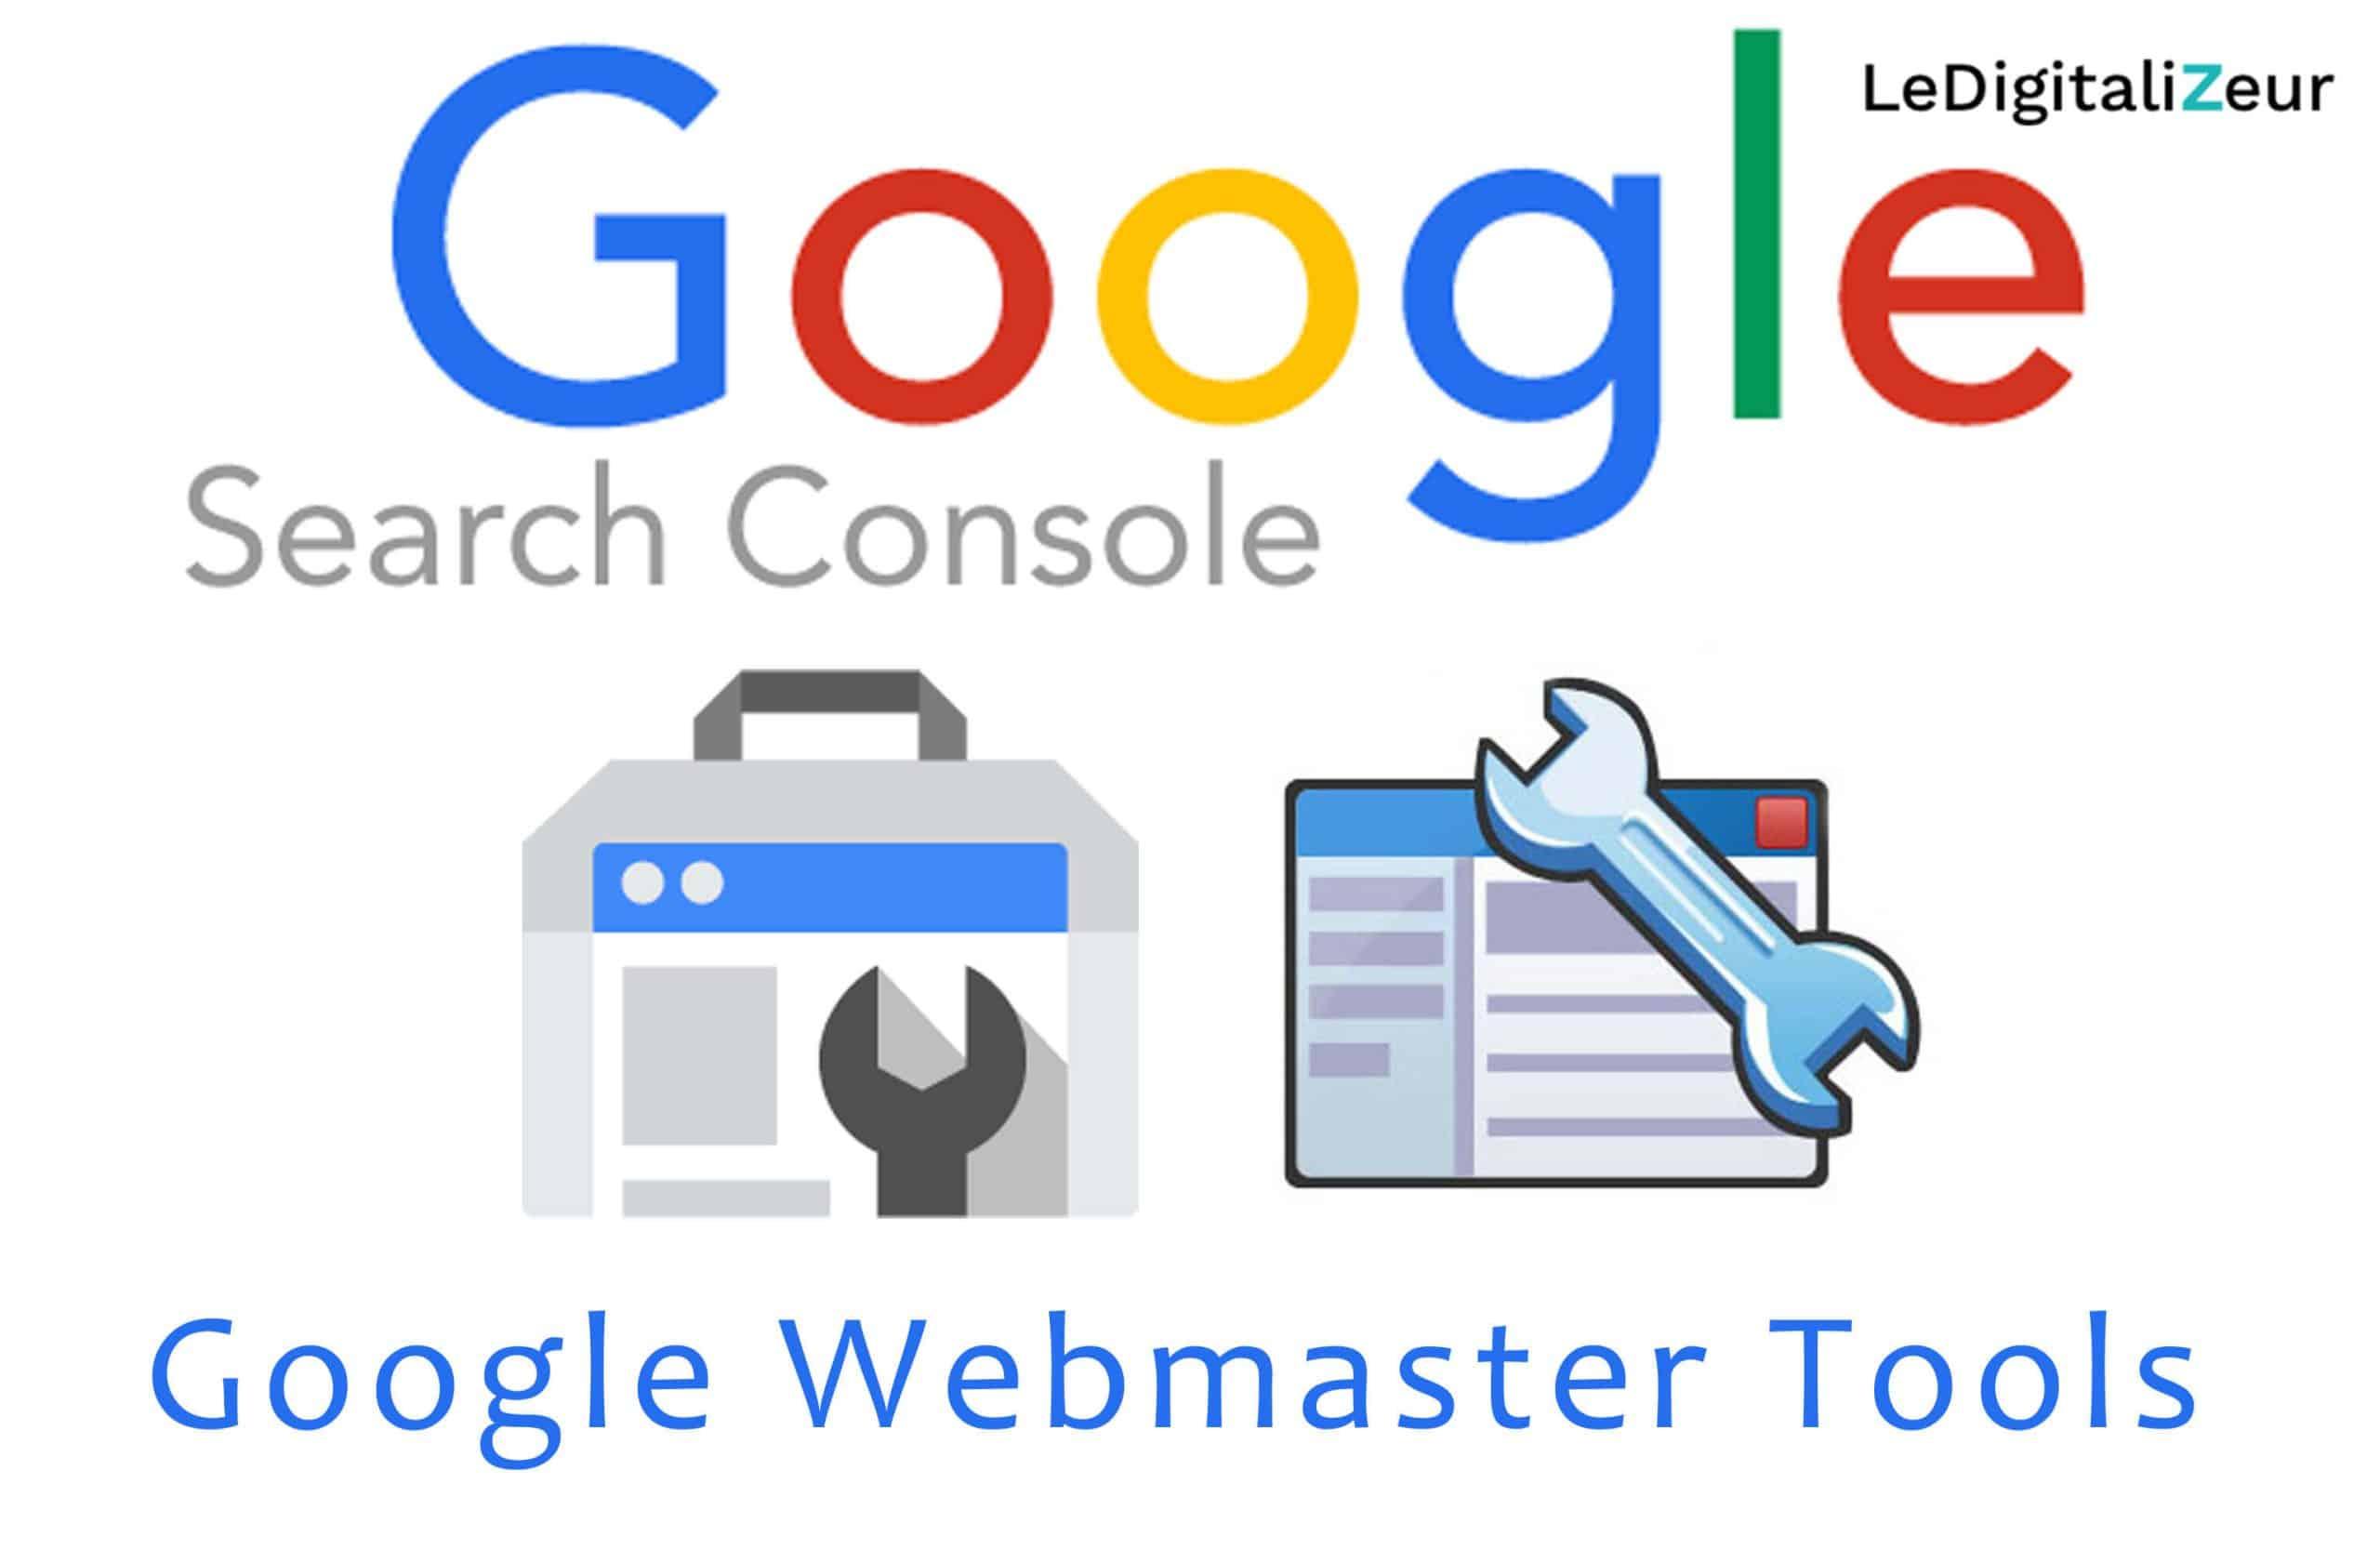 logo Google search console ledigitalizeur